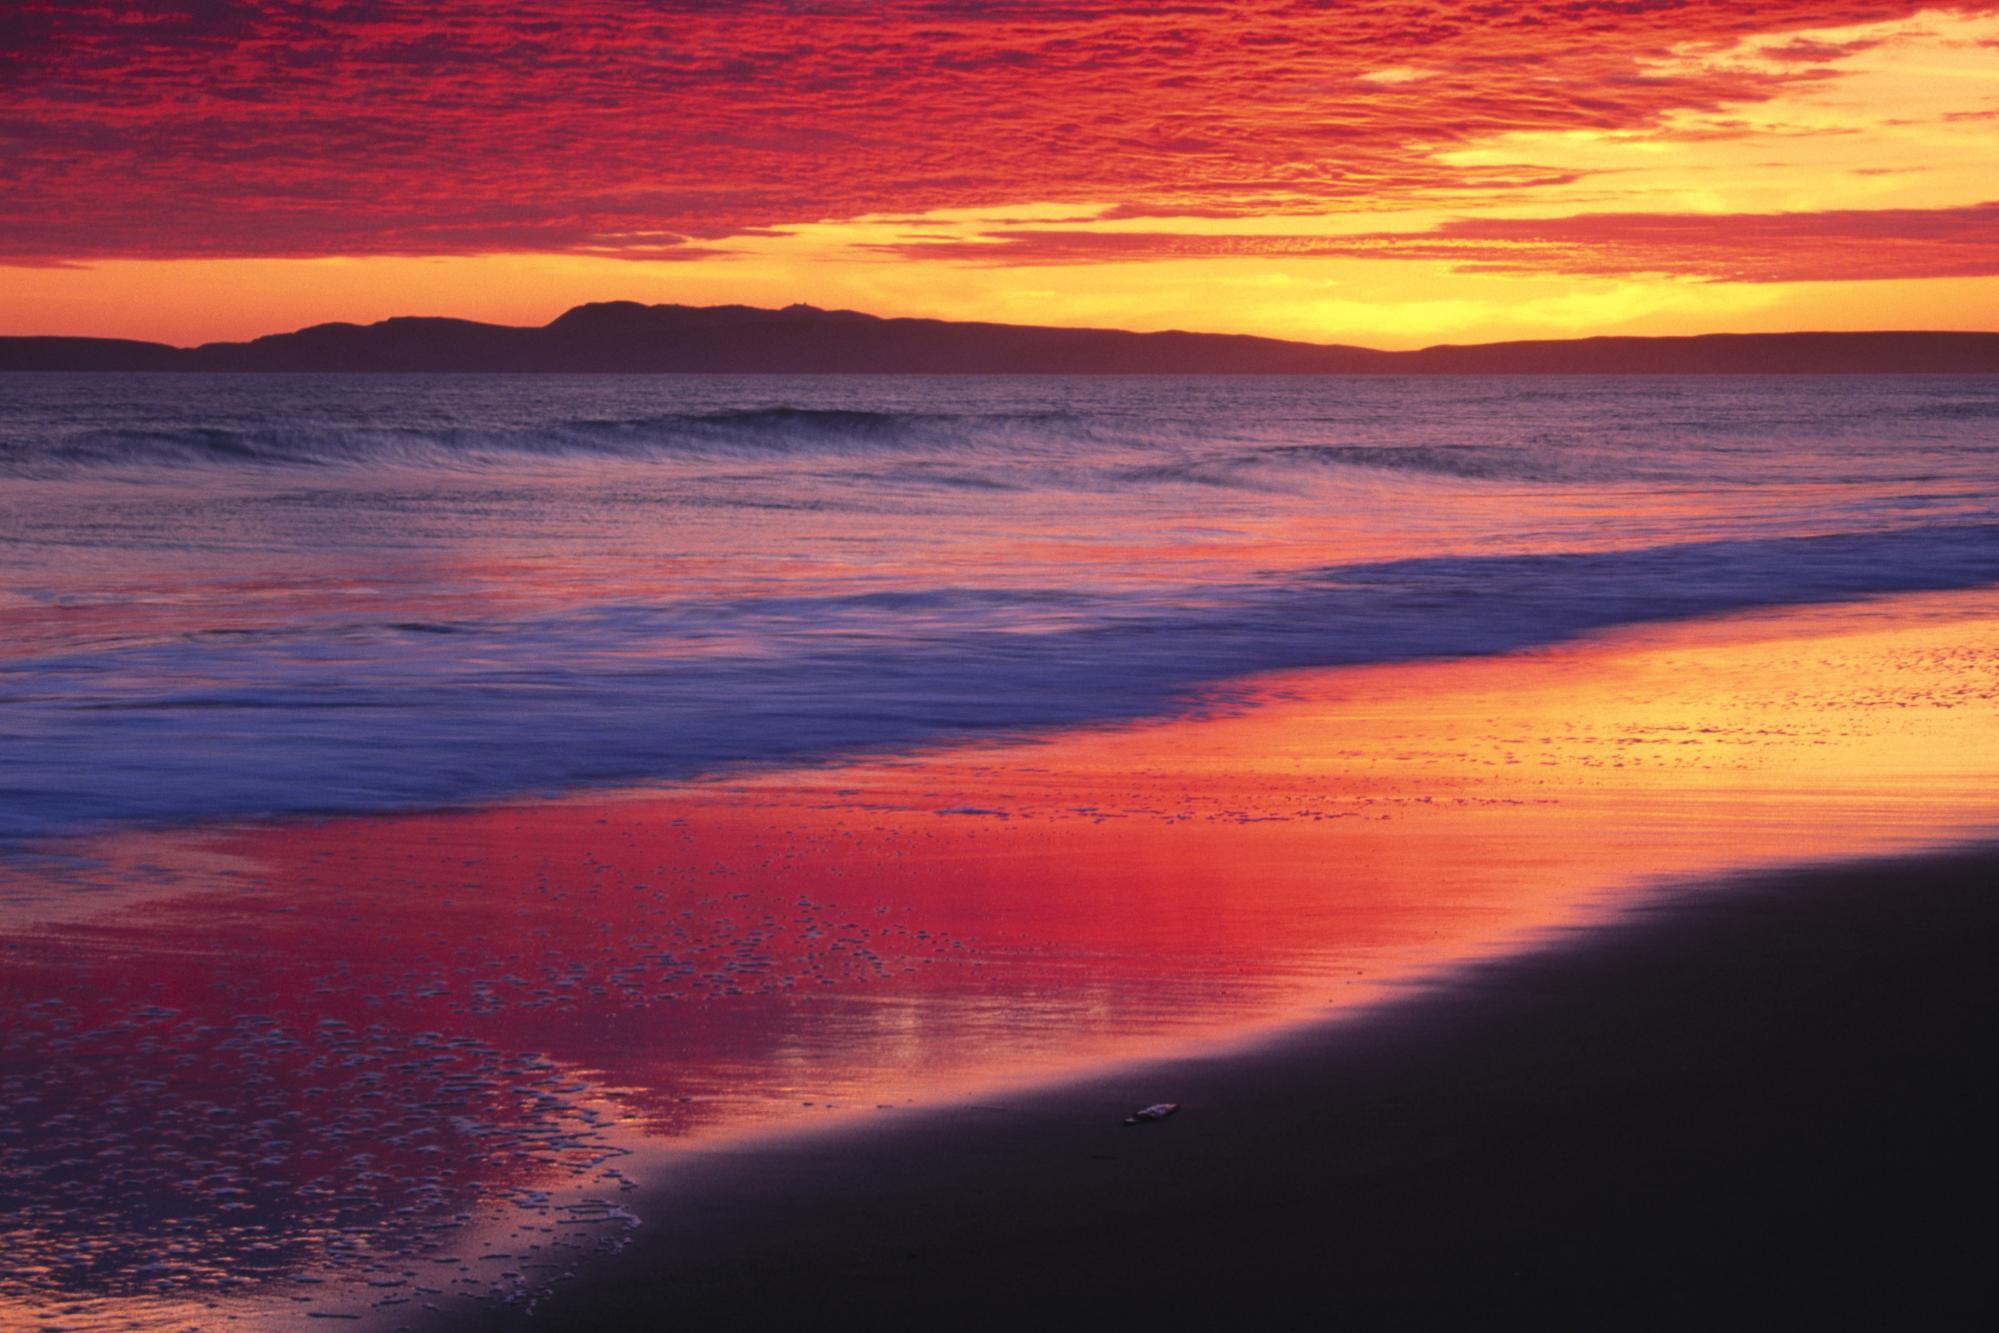 Desktop Backgrounds Sunset | galleryhip.com - The Hippest ...